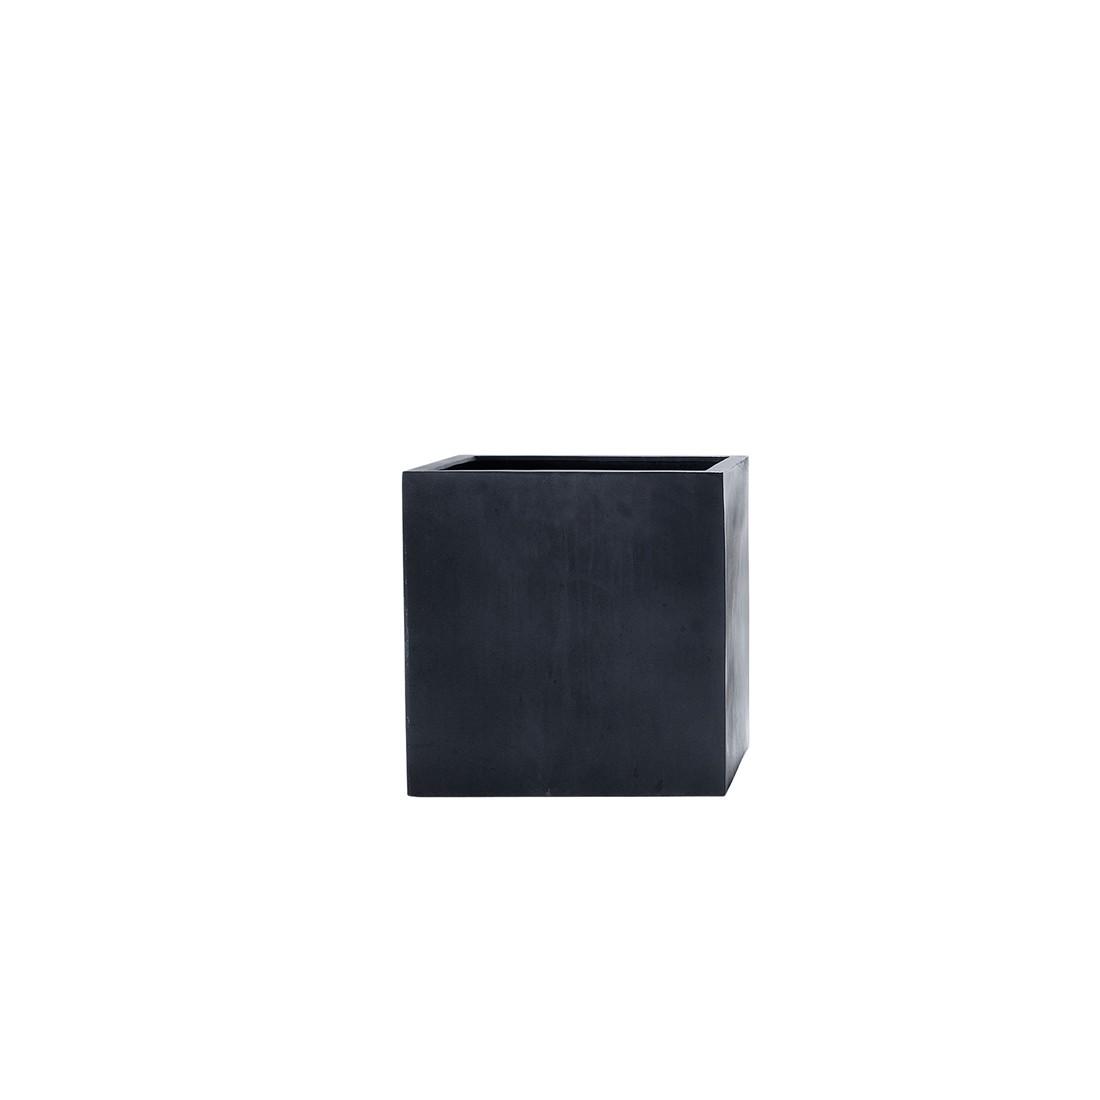 Stonefiber Pot lang hoch – Polyesterharzkunststoff Schwarz – 60x30x60, amei jetzt bestellen